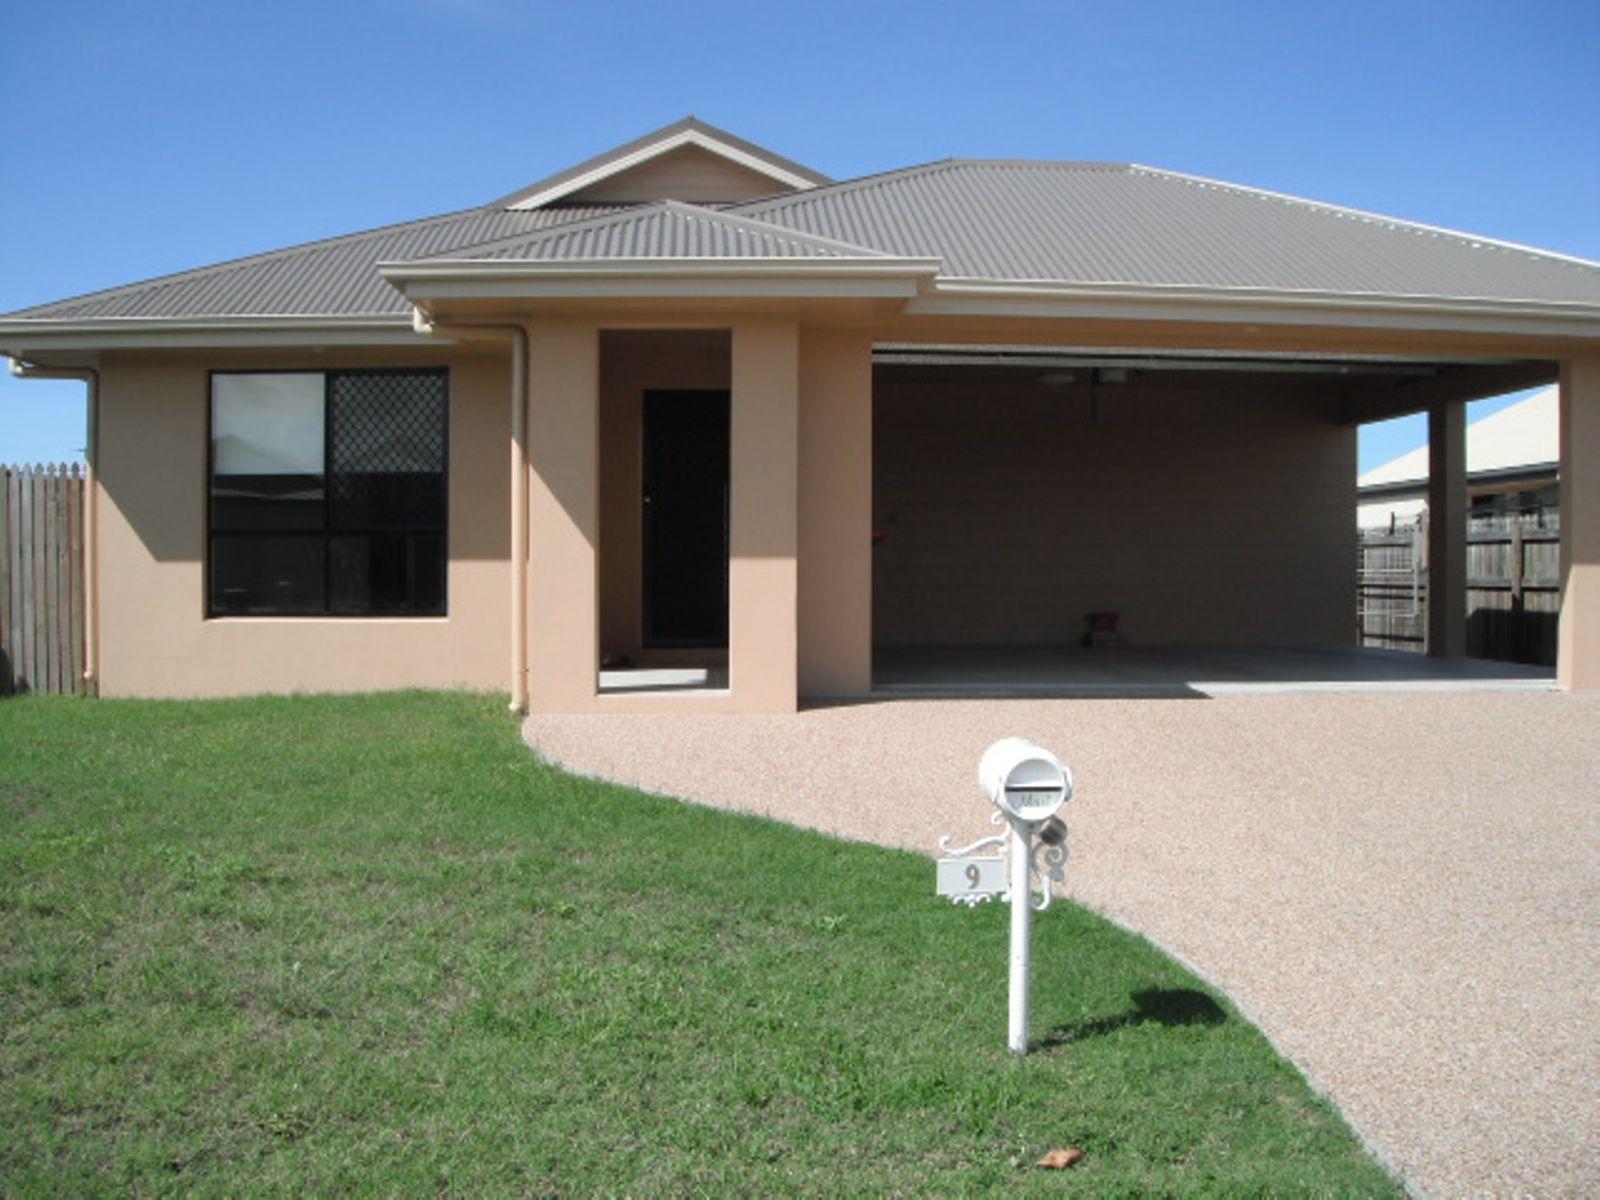 9 Lashmar Crescent, Deeragun, QLD 4818